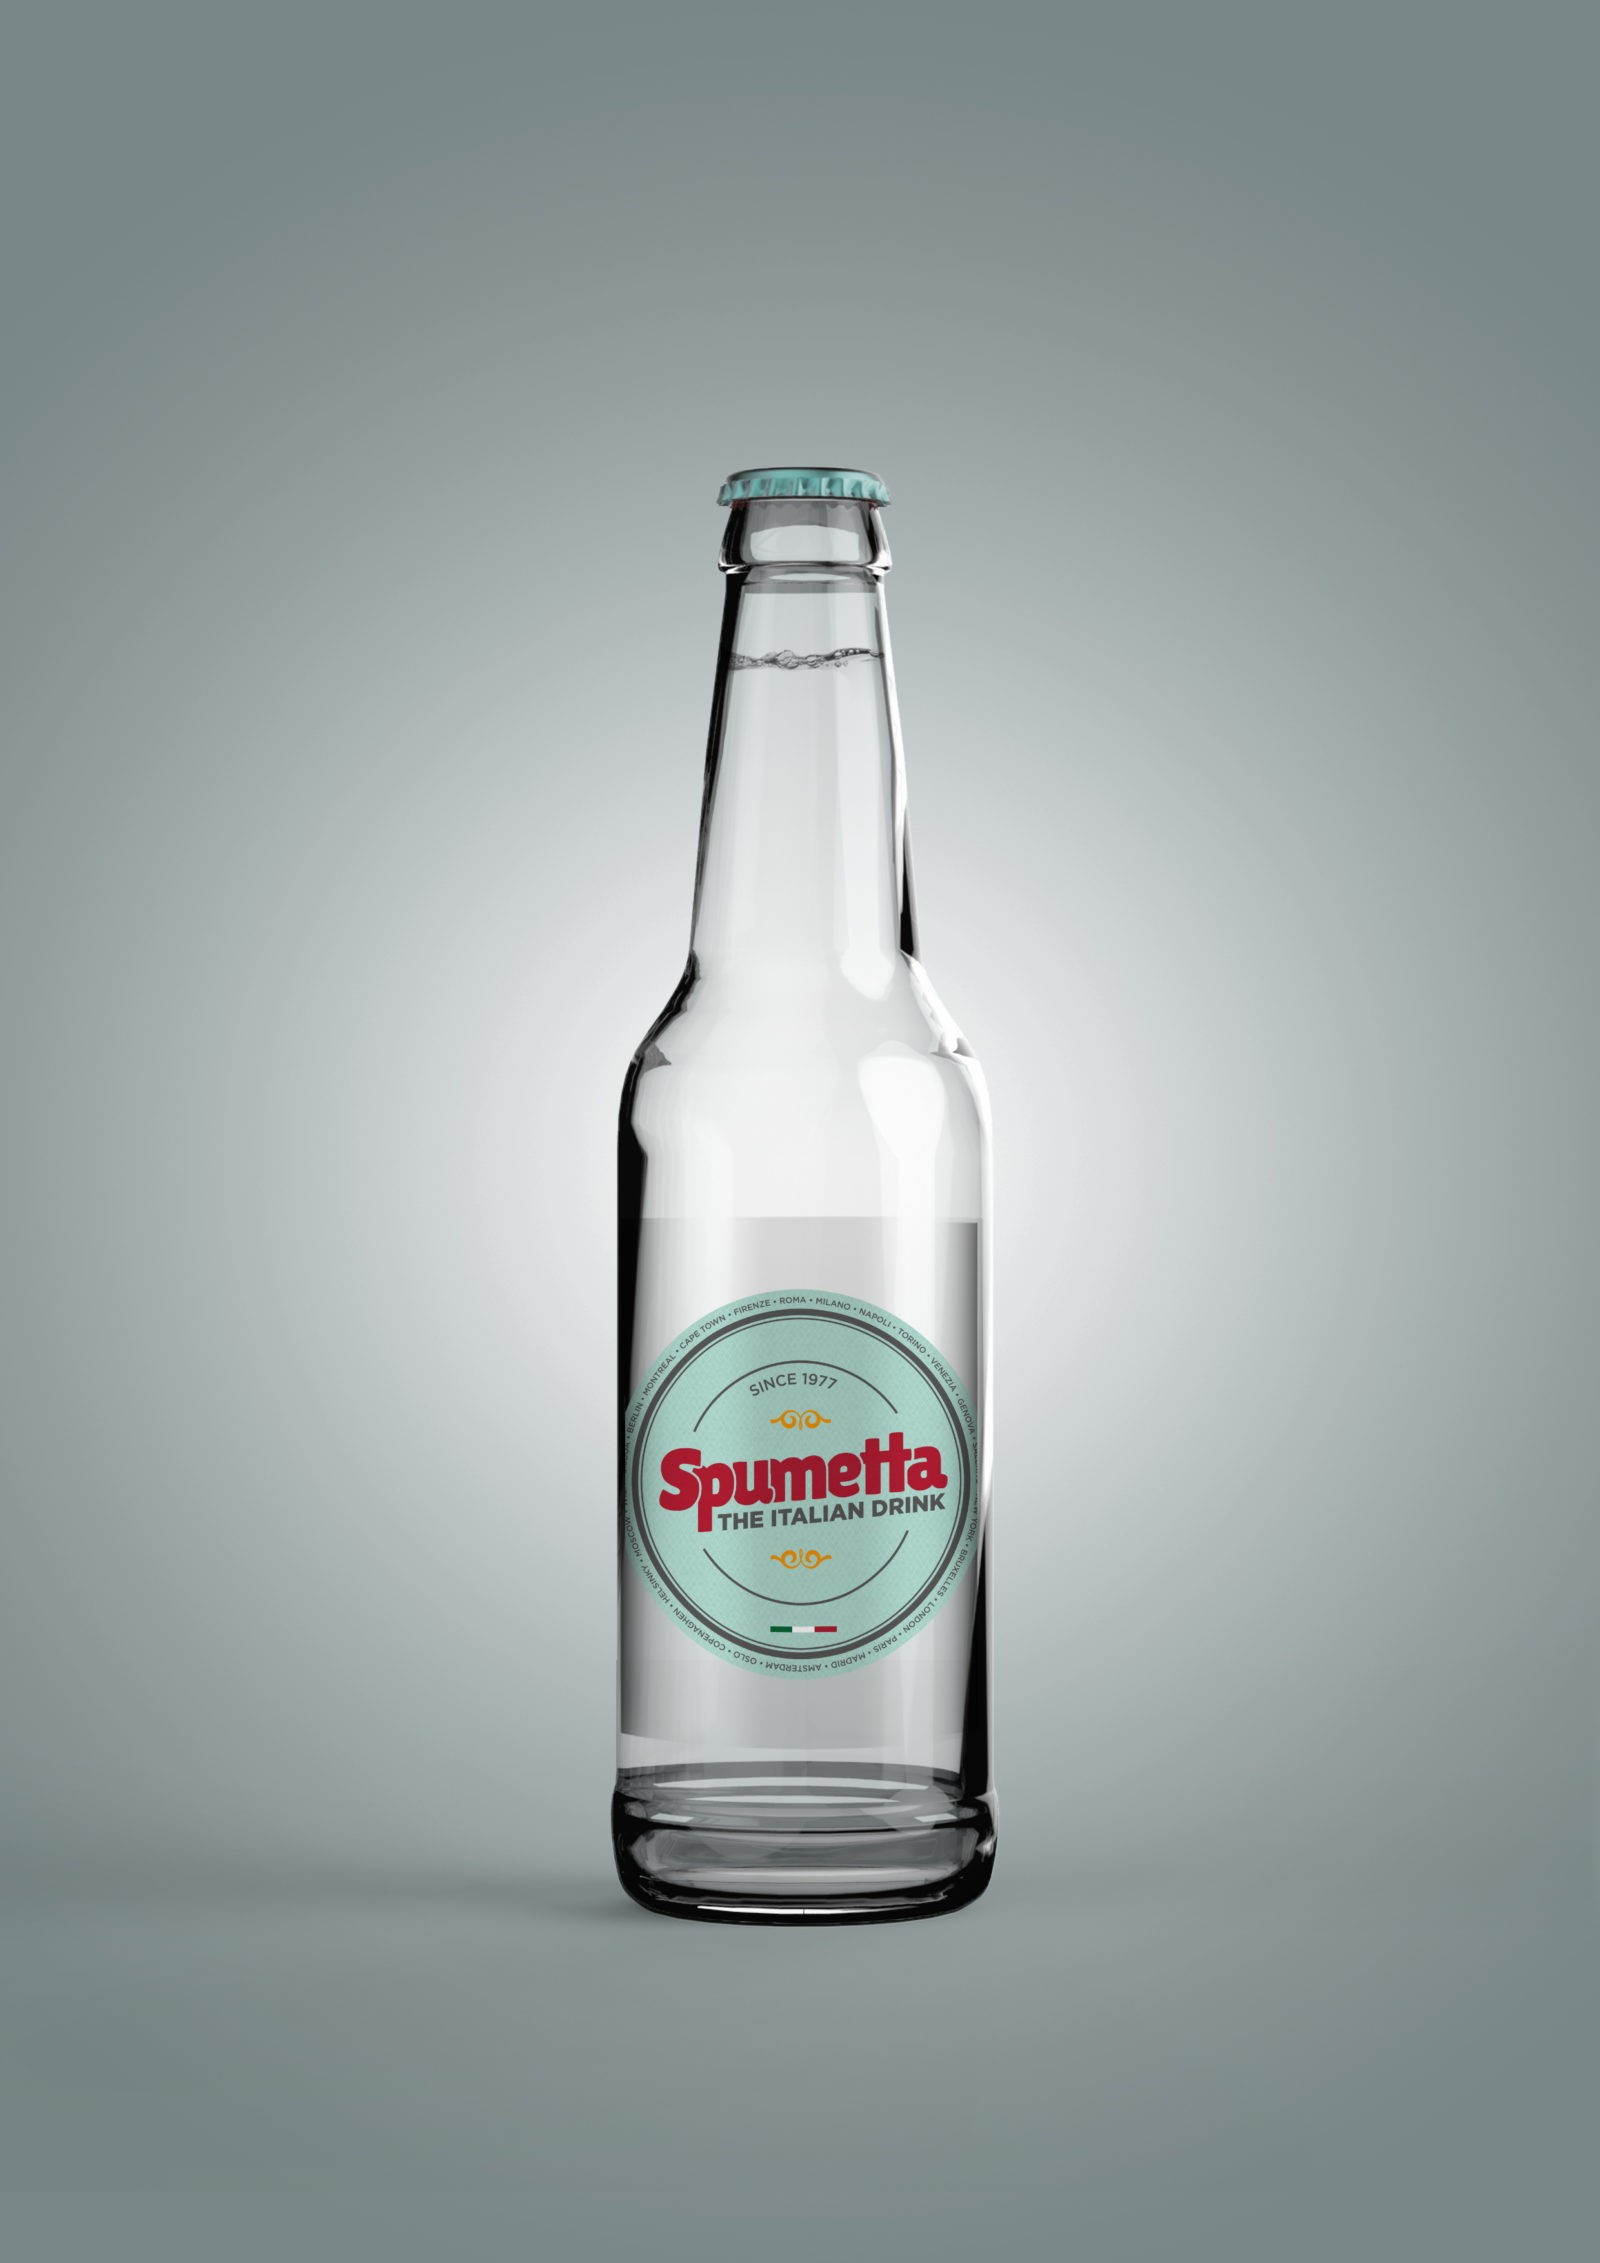 Spumetta italian drink